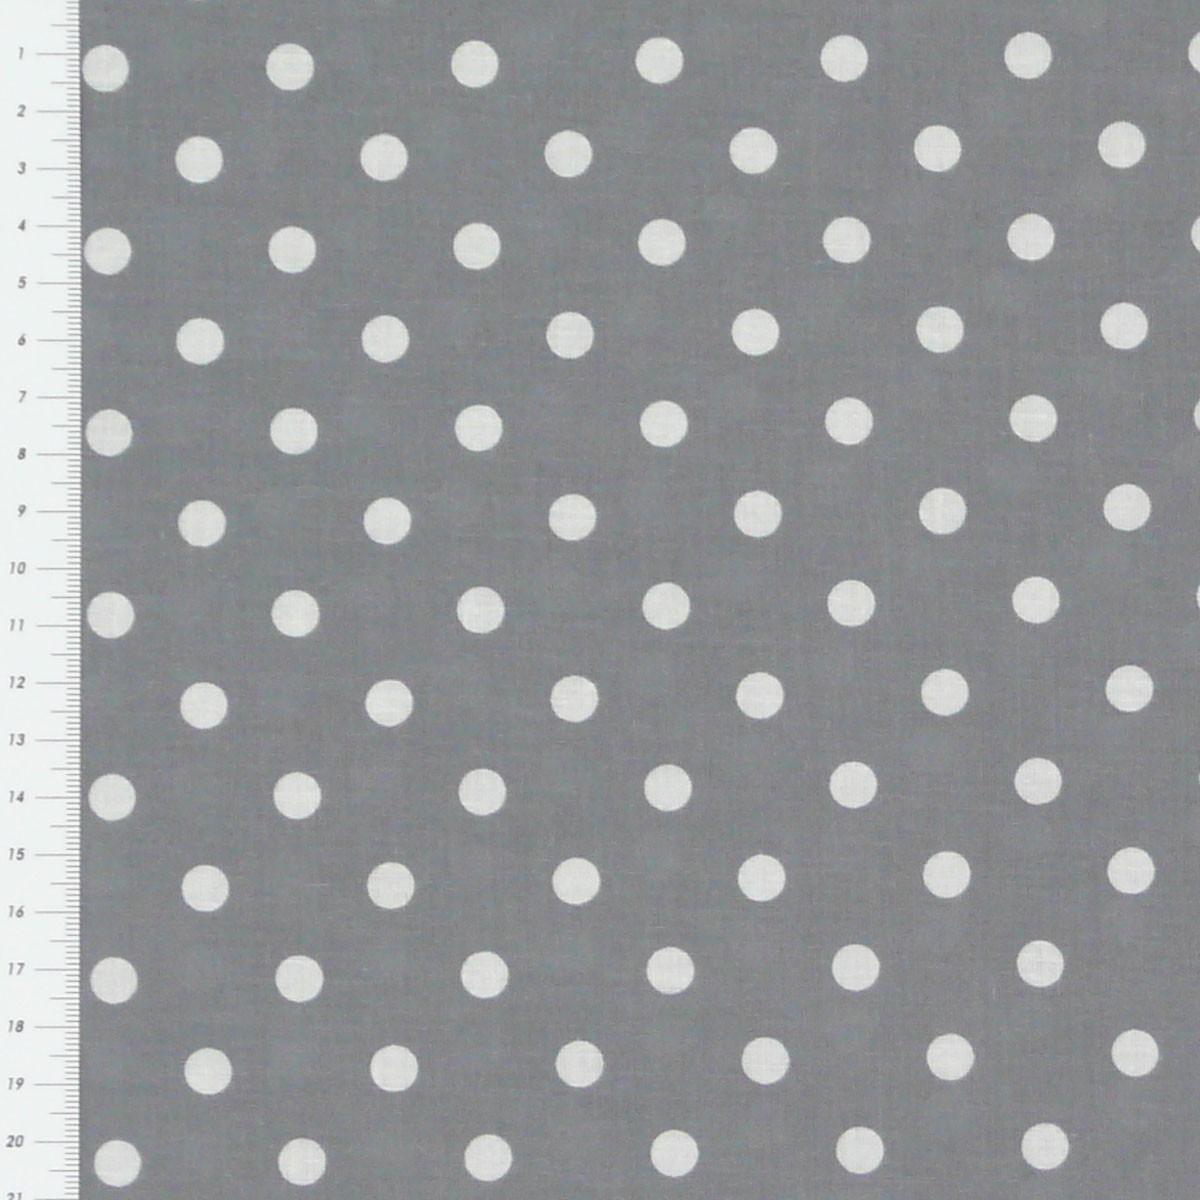 baumwollstoff punkte gro 7mm grau wei stoffe stoffe gemustert stoff punkte. Black Bedroom Furniture Sets. Home Design Ideas